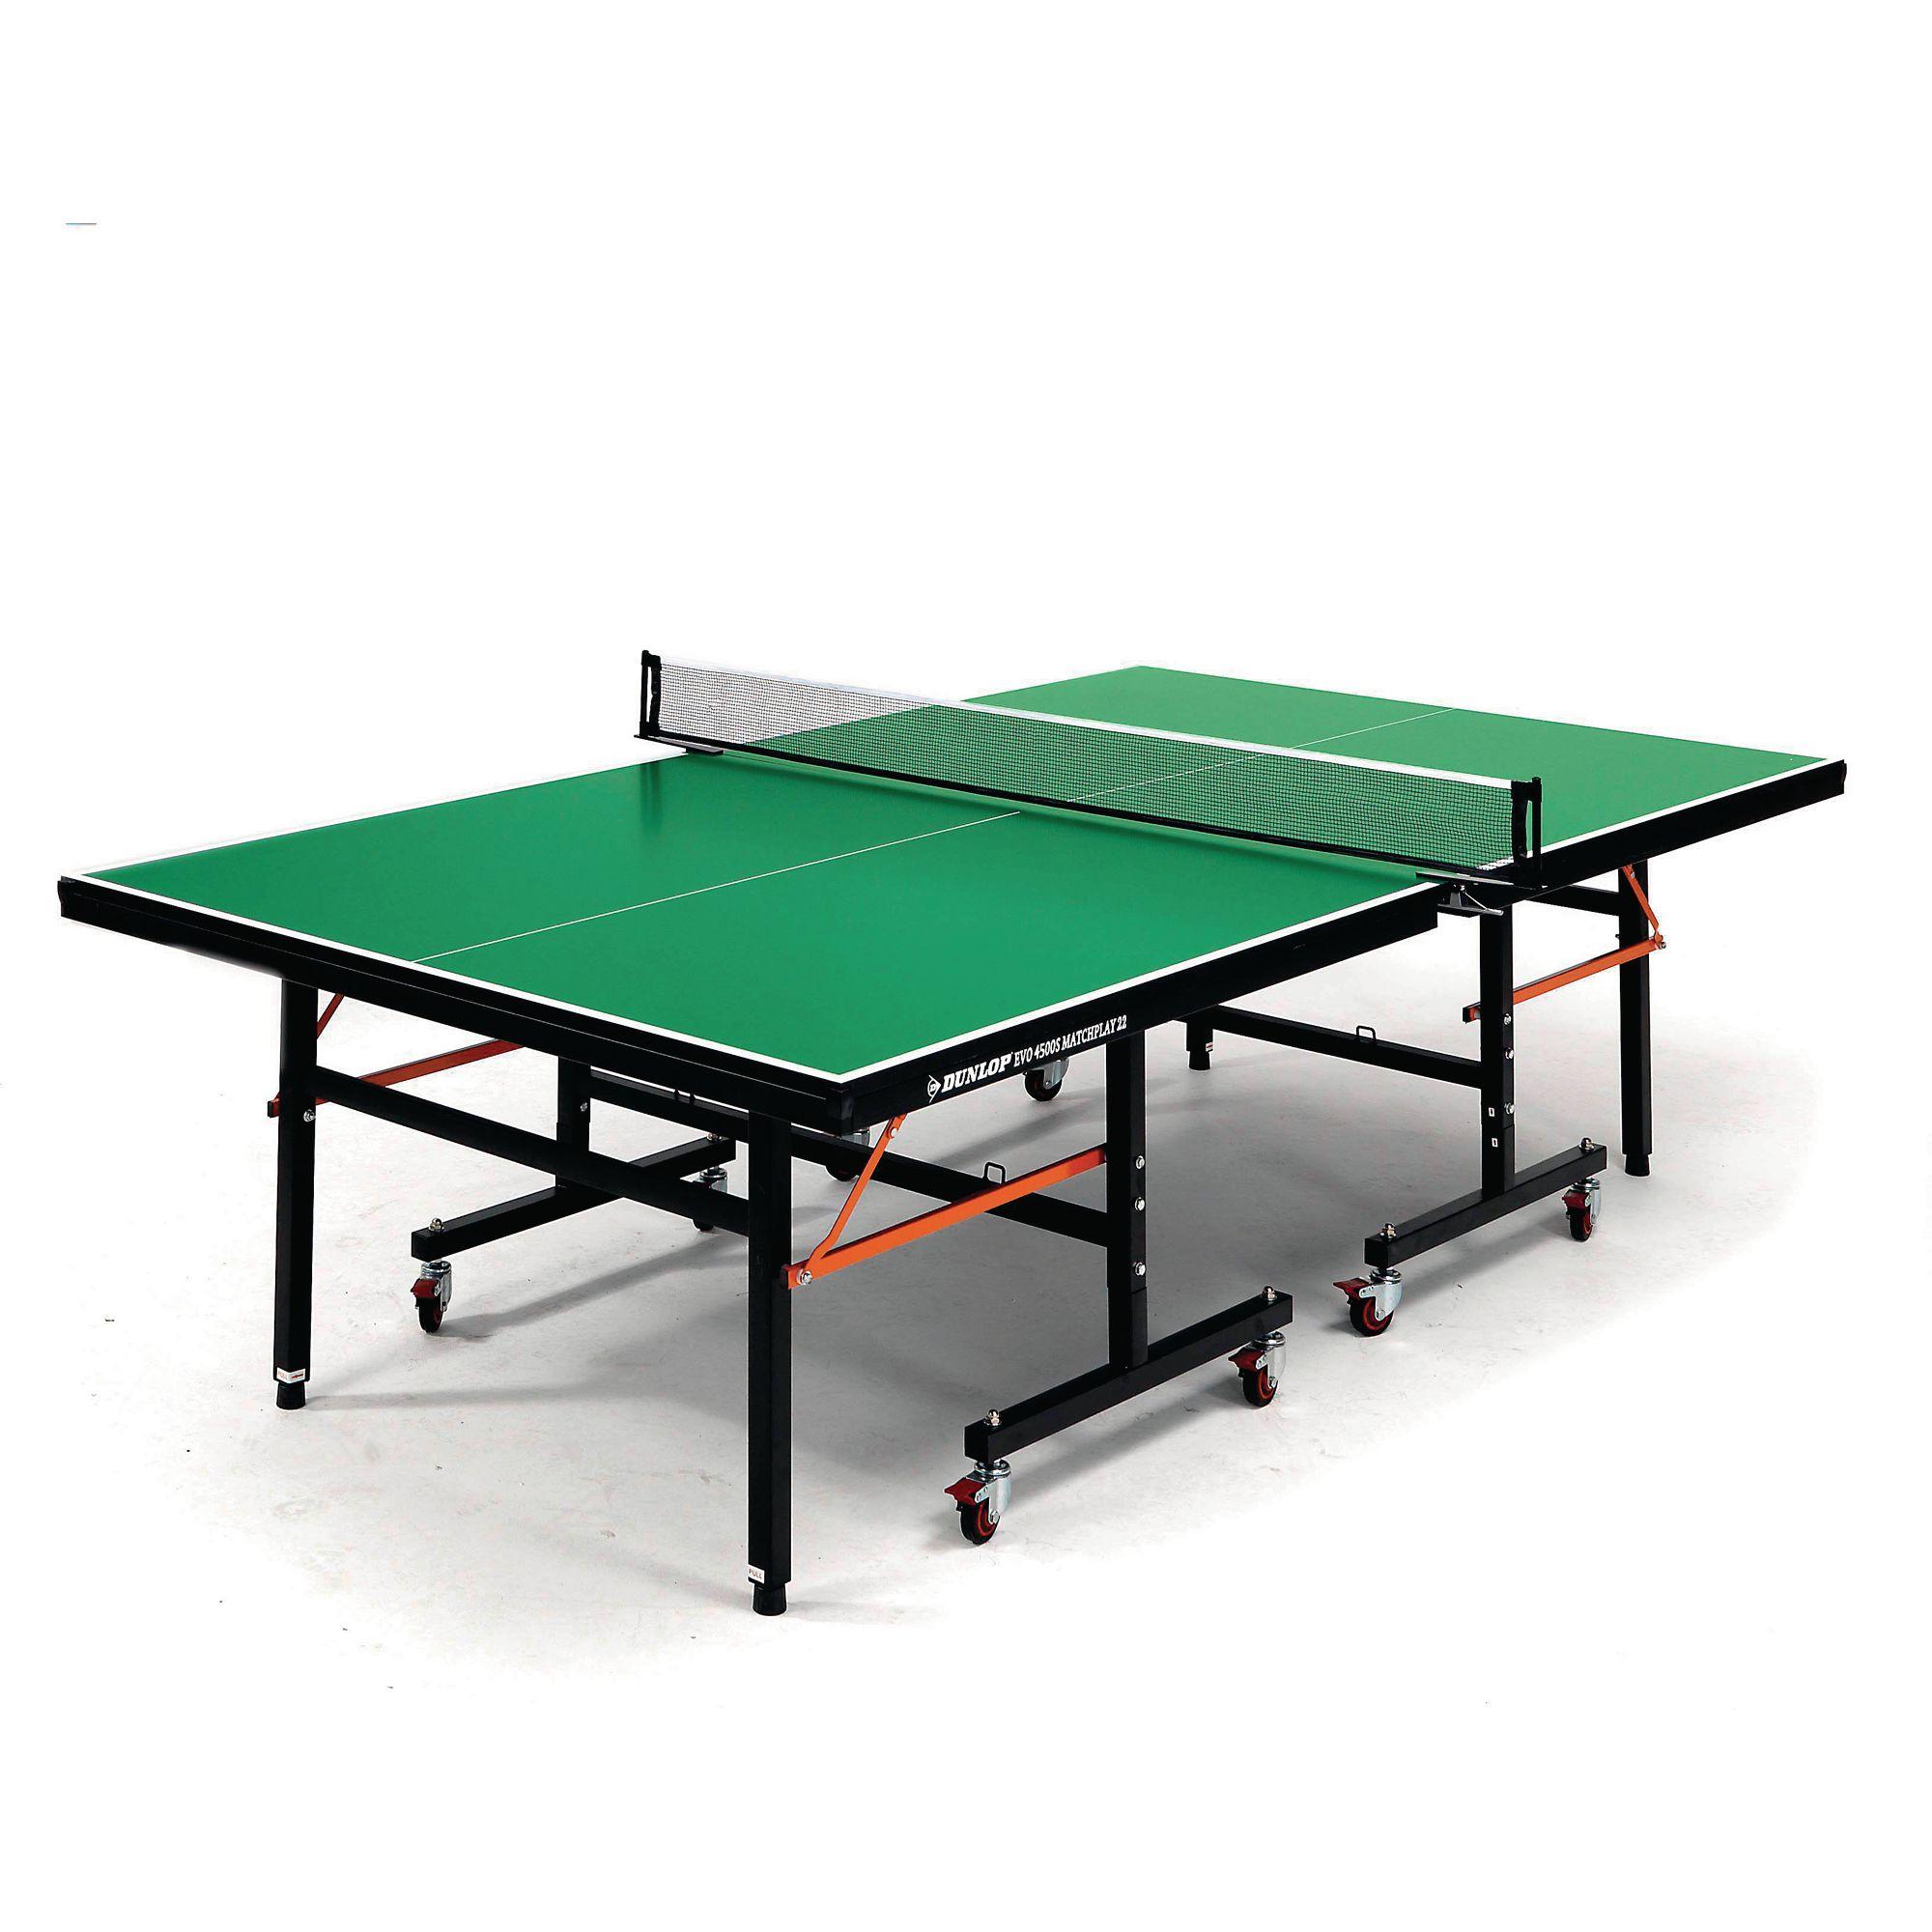 - Dunlop® EVO4500S Table Tennis Table - Green - PTBP07338 Davies